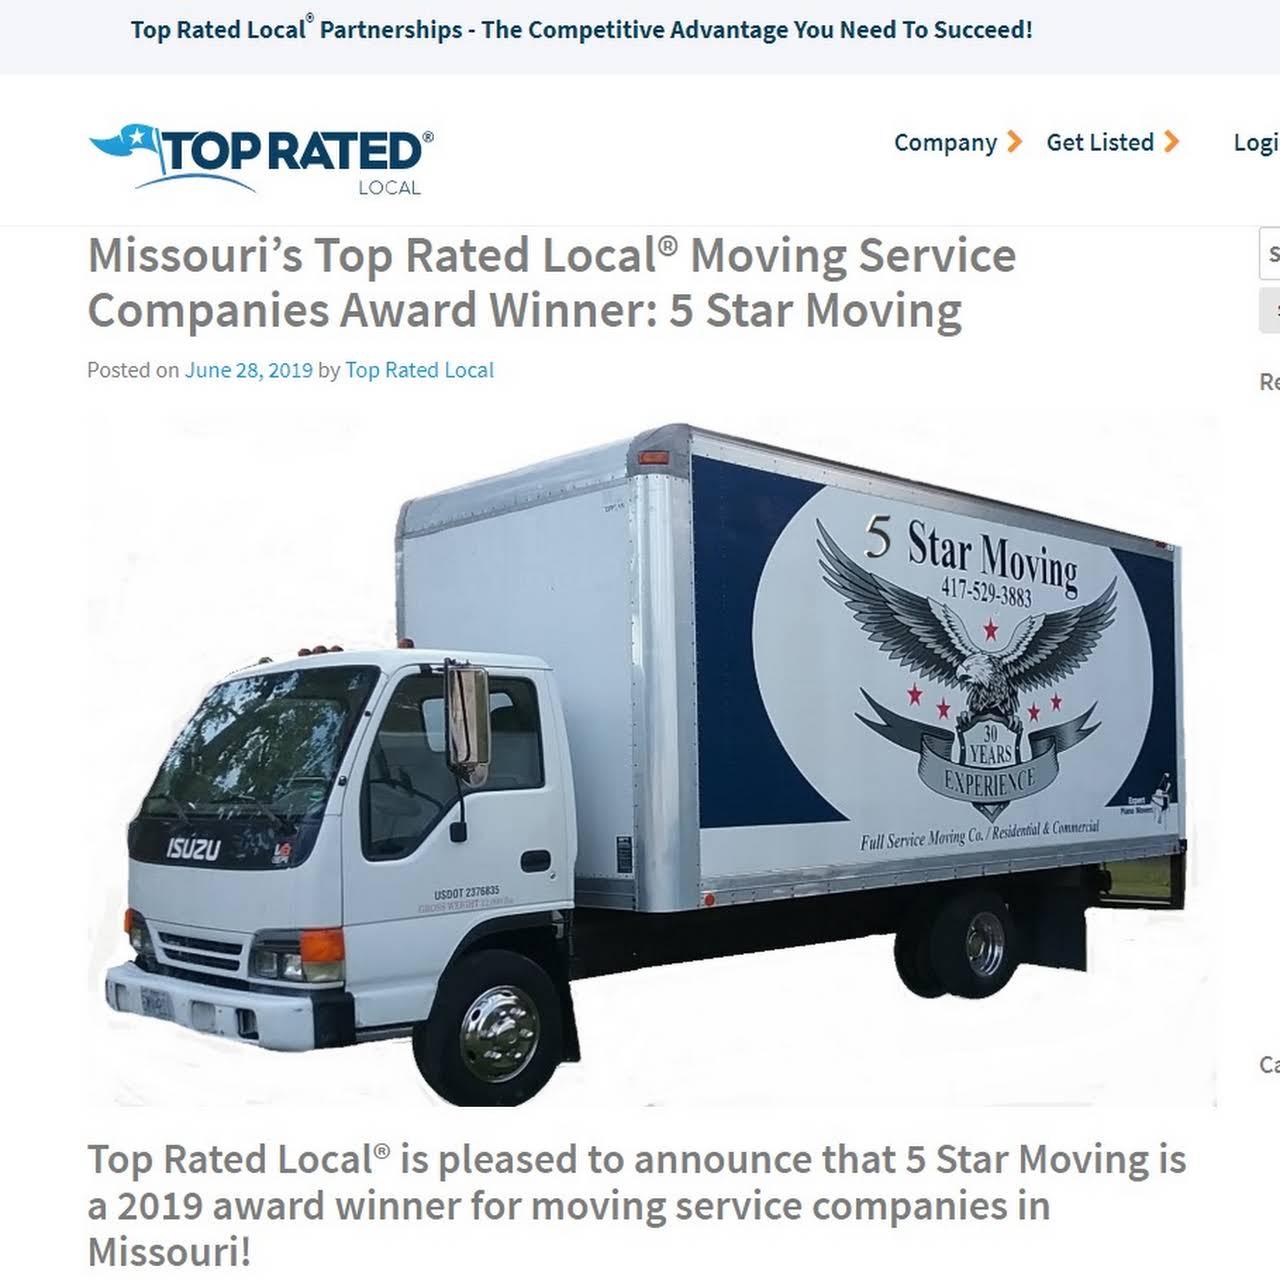 5 Star Moving - Moving Company in Joplin